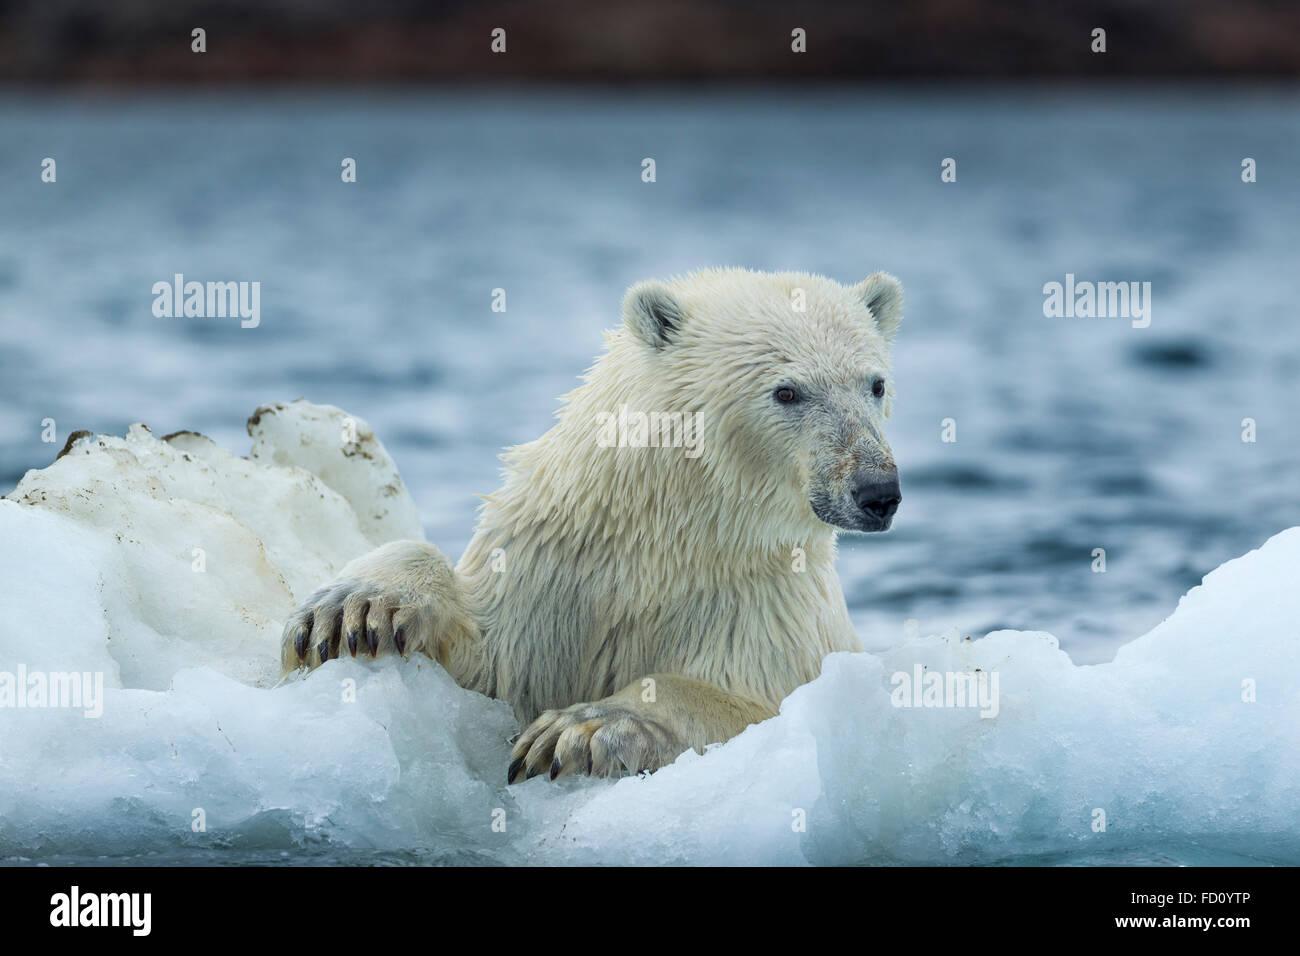 Canada, Nunavut Territory, Repulse Bay, Polar Bear (Ursus maritimus) holding onto melting sea ice near Harbour Islands - Stock Image